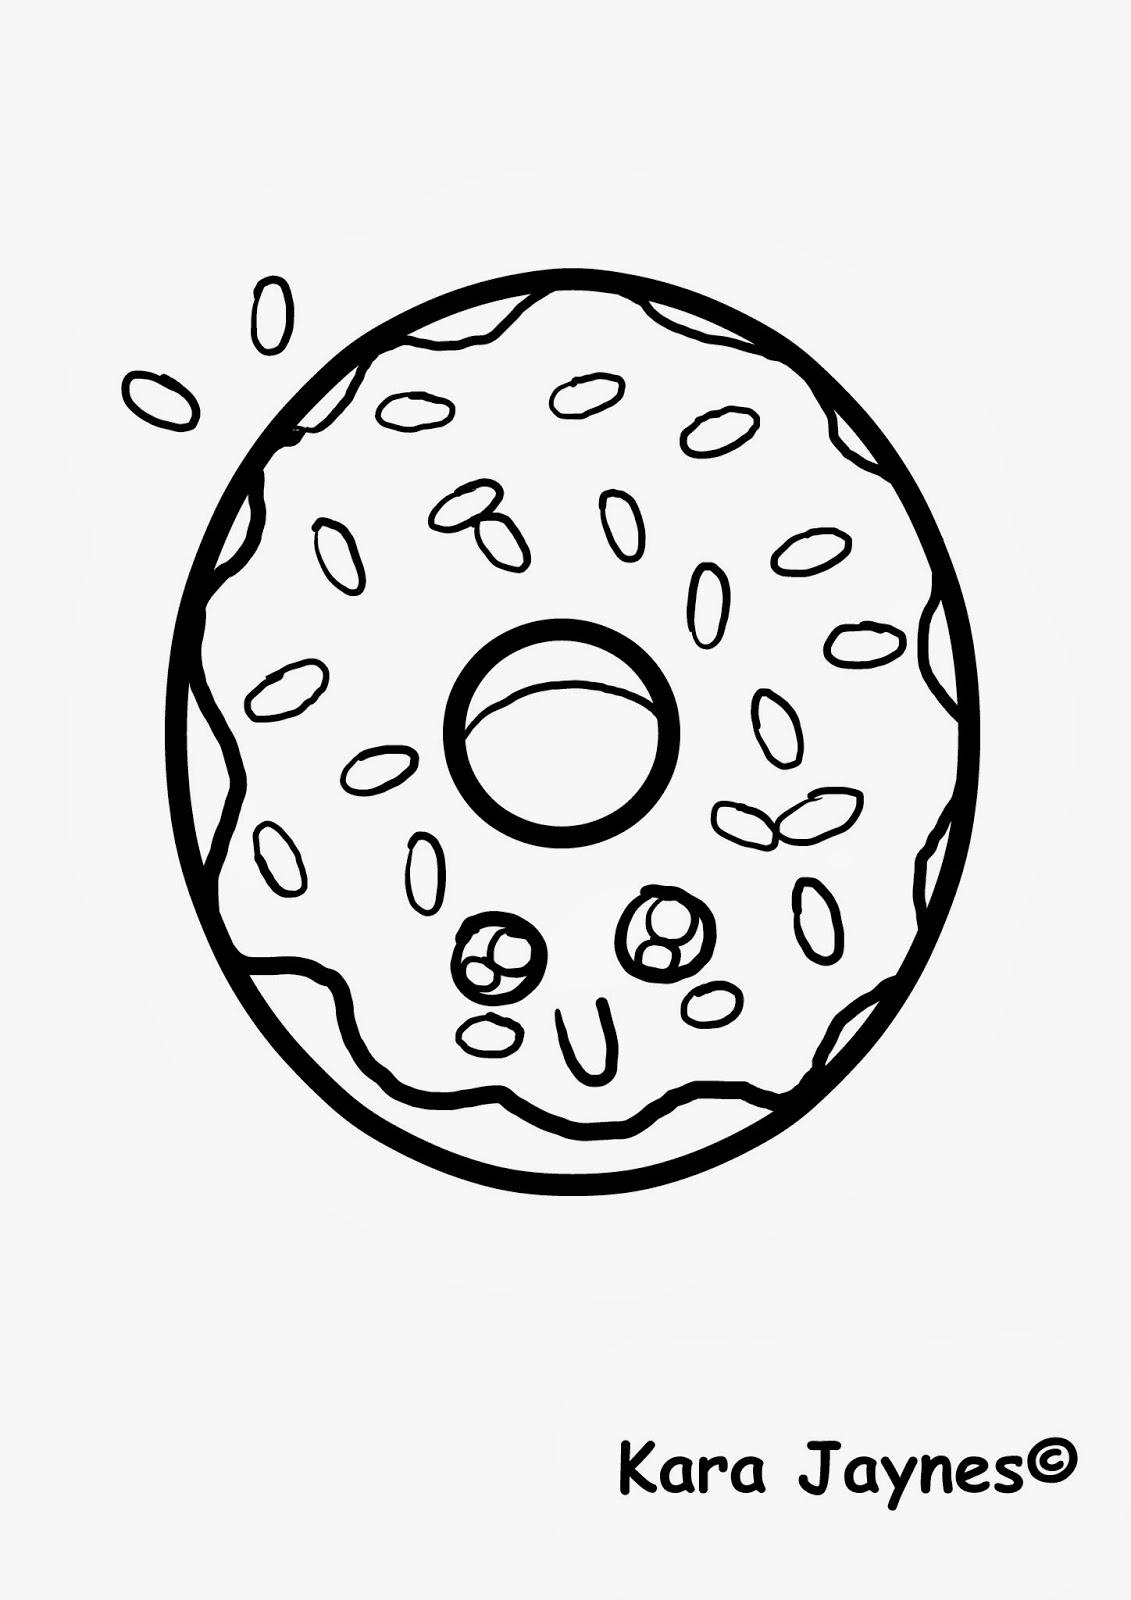 donut coloring page kara jaynes kawaii donut coloring page donut coloring page